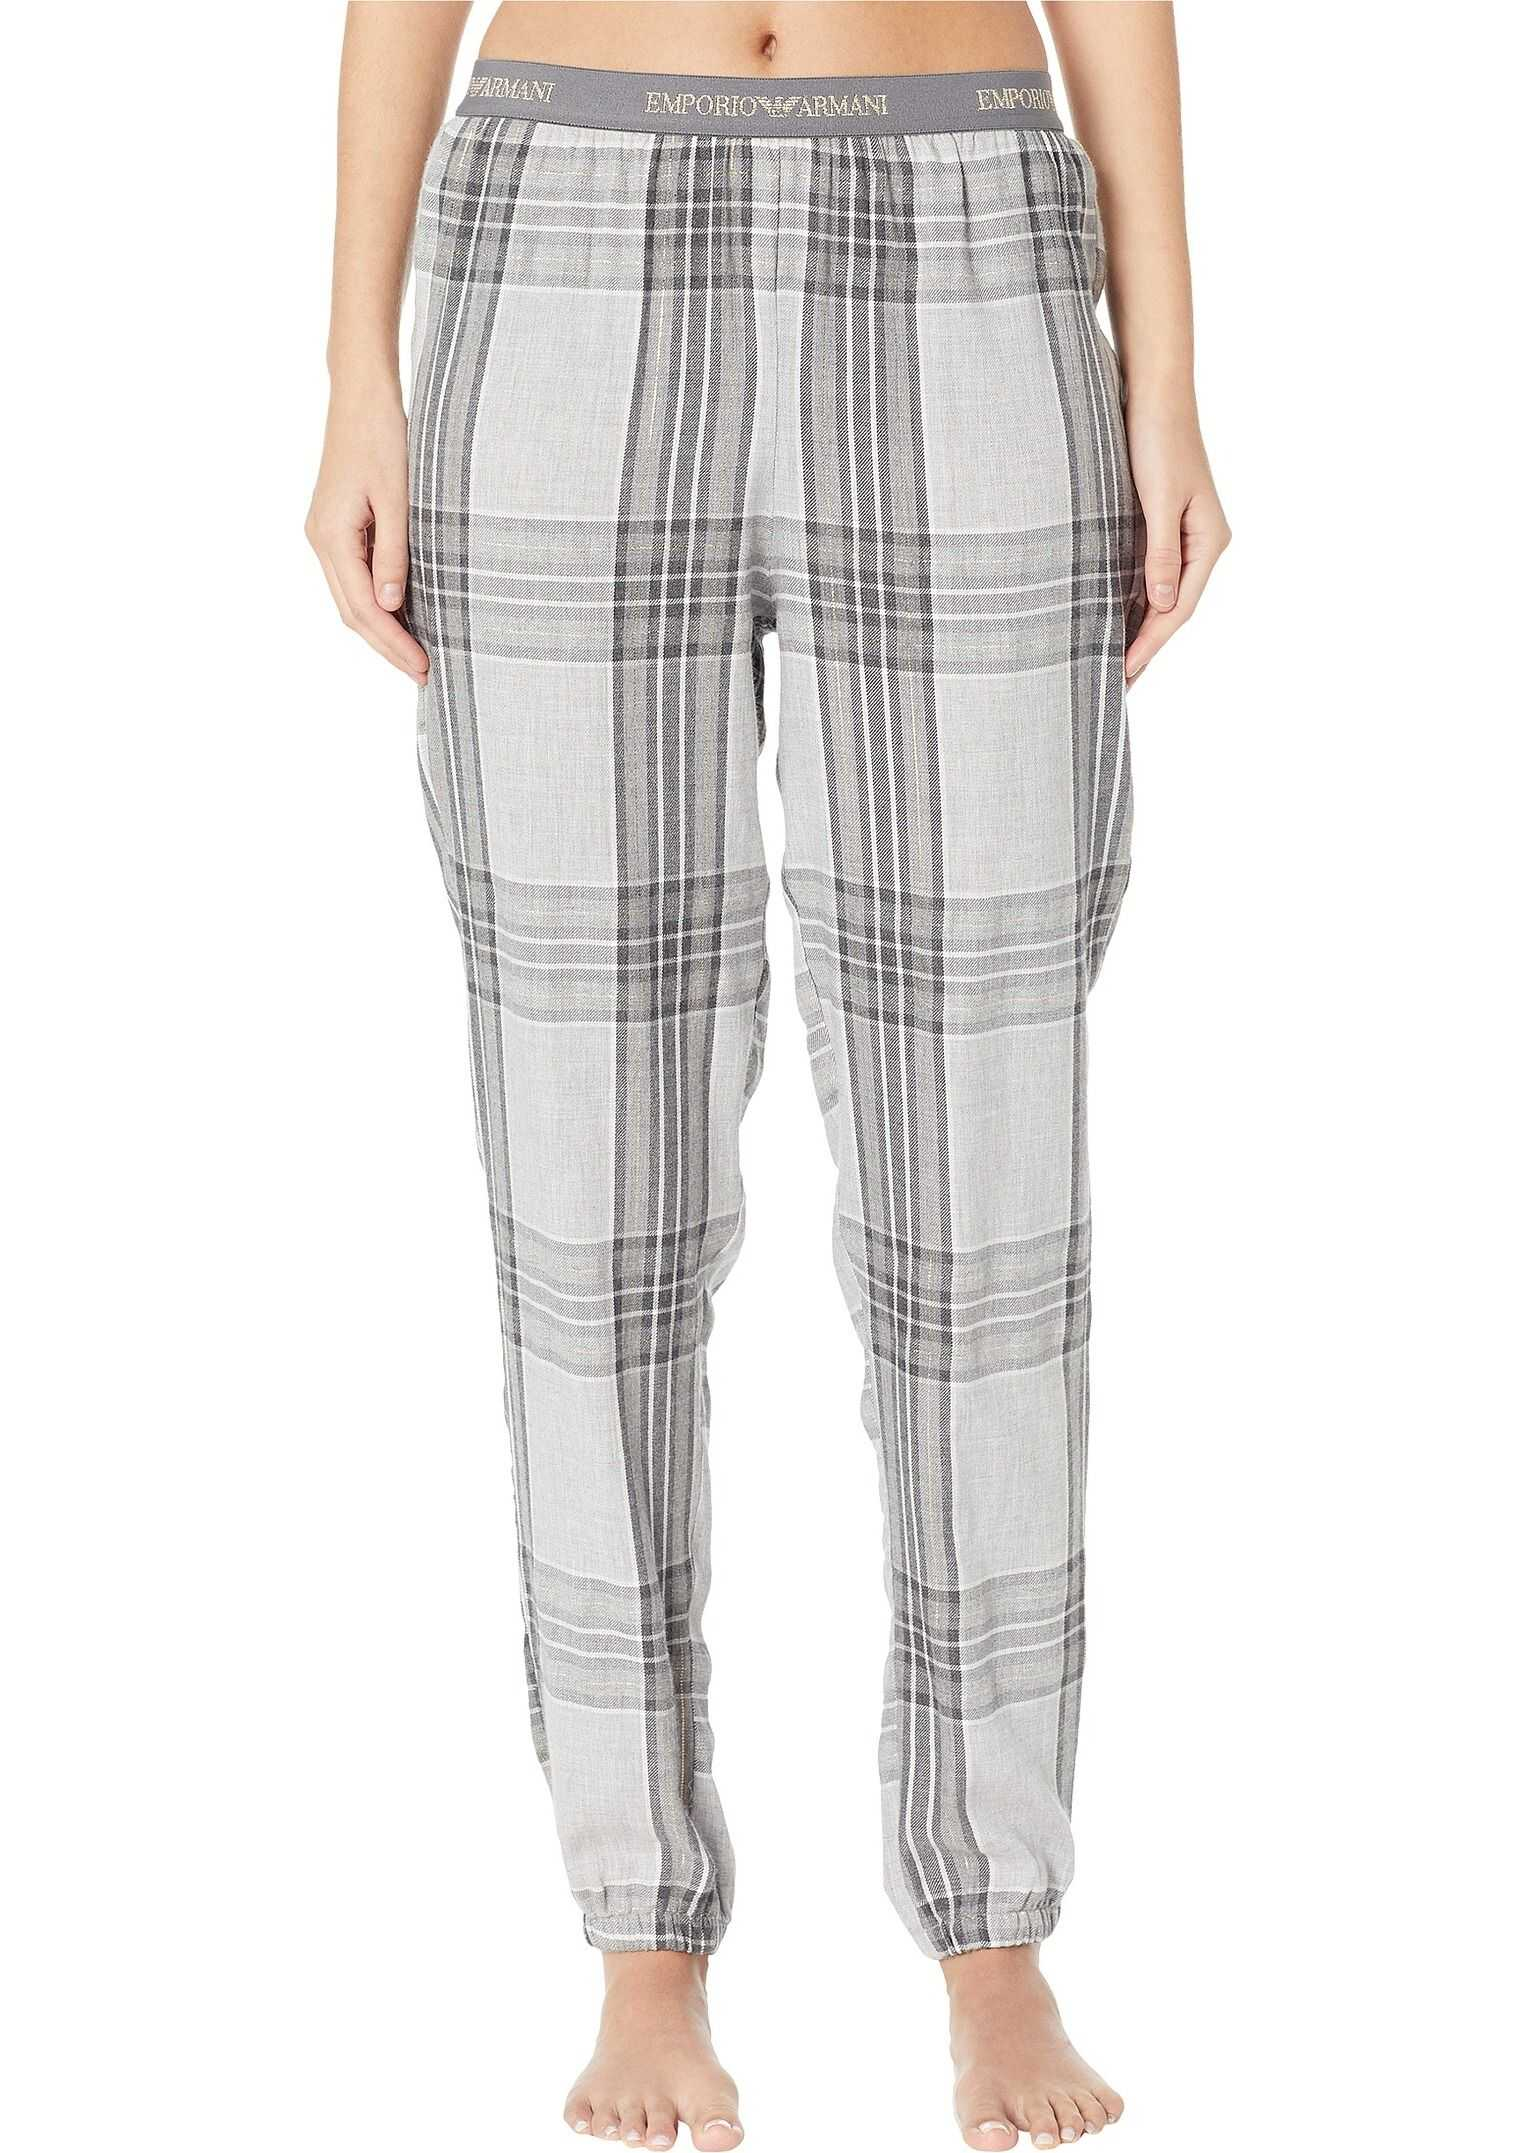 Emporio Armani Tartan Flannel Pajama Bottoms Grey Tartan